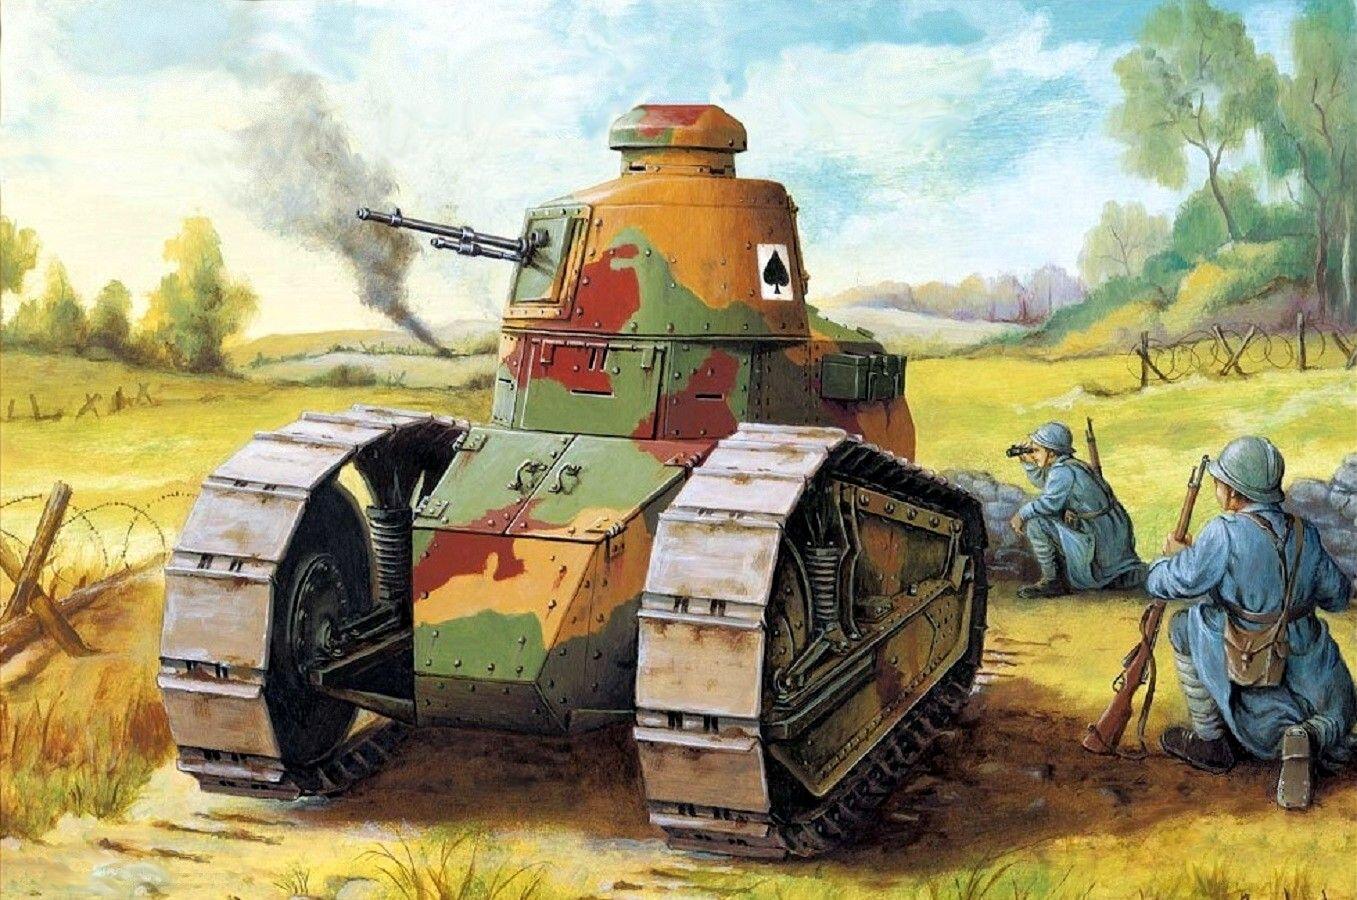 Peter Dennis Osprey Bing Obrazy French Renault Ft 17 Zametki Na Budushe World War One Military Art I Wwi